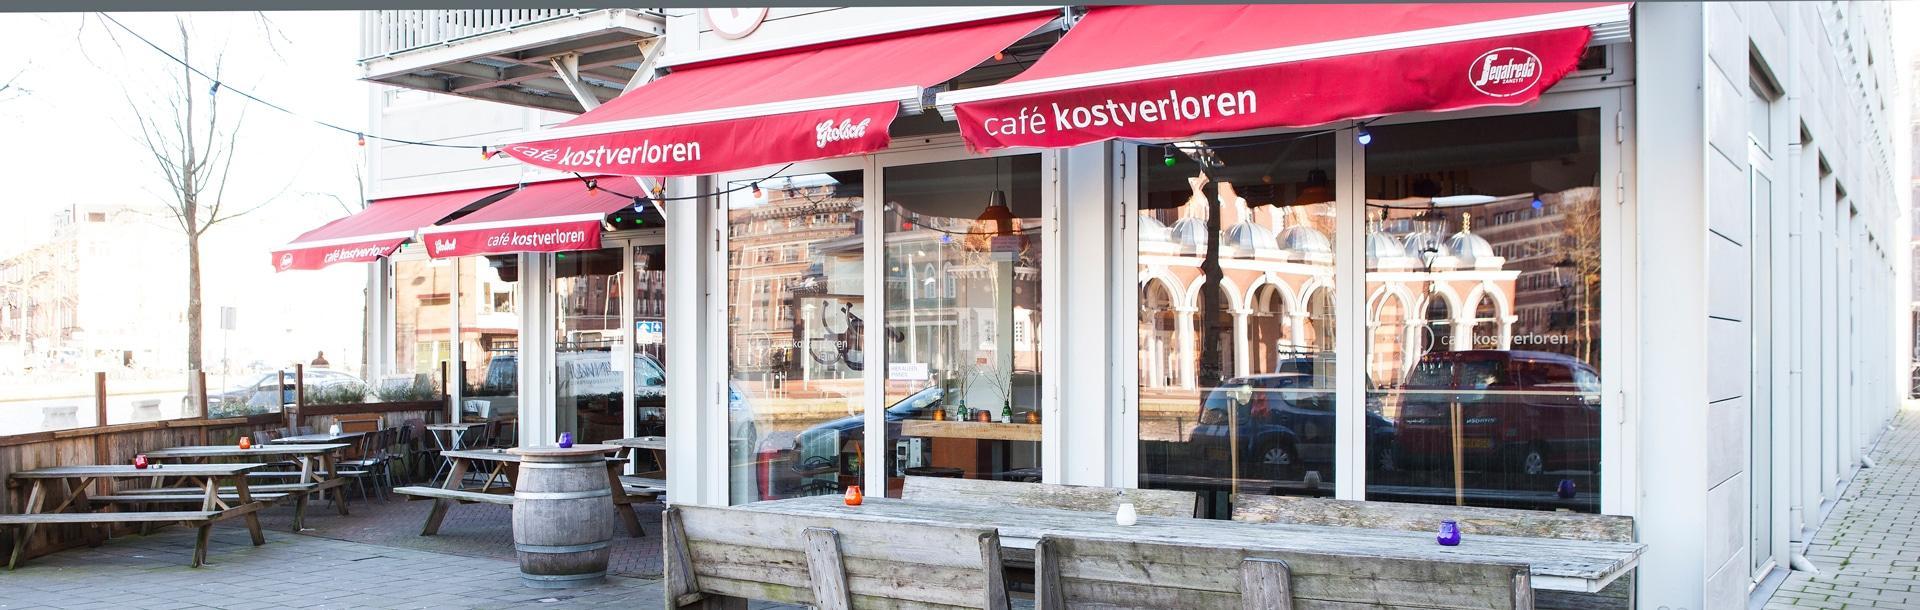 Cafe_Kosteverloren_Nice2know_locatie